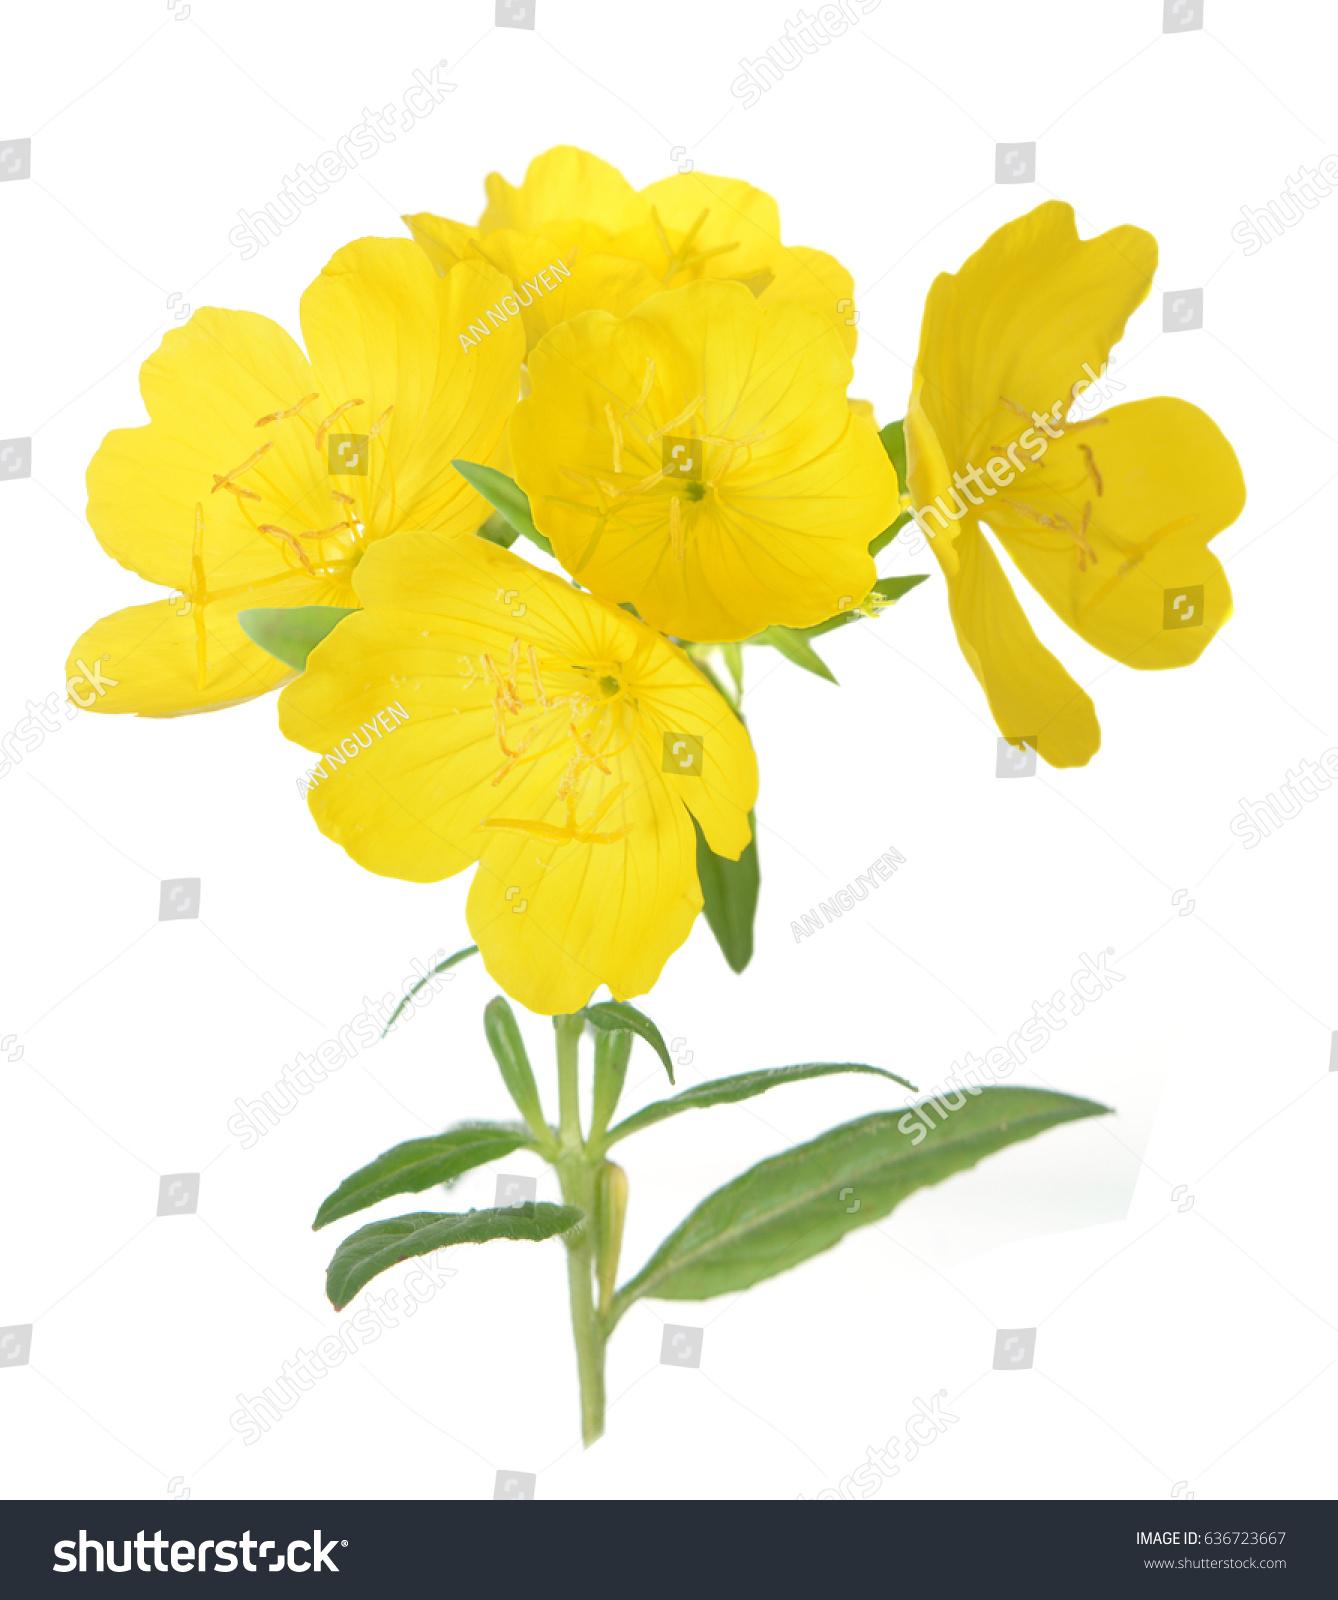 Yellow Primrose Oenothera Frutcosa Flower Isolated On White Ez Canvas